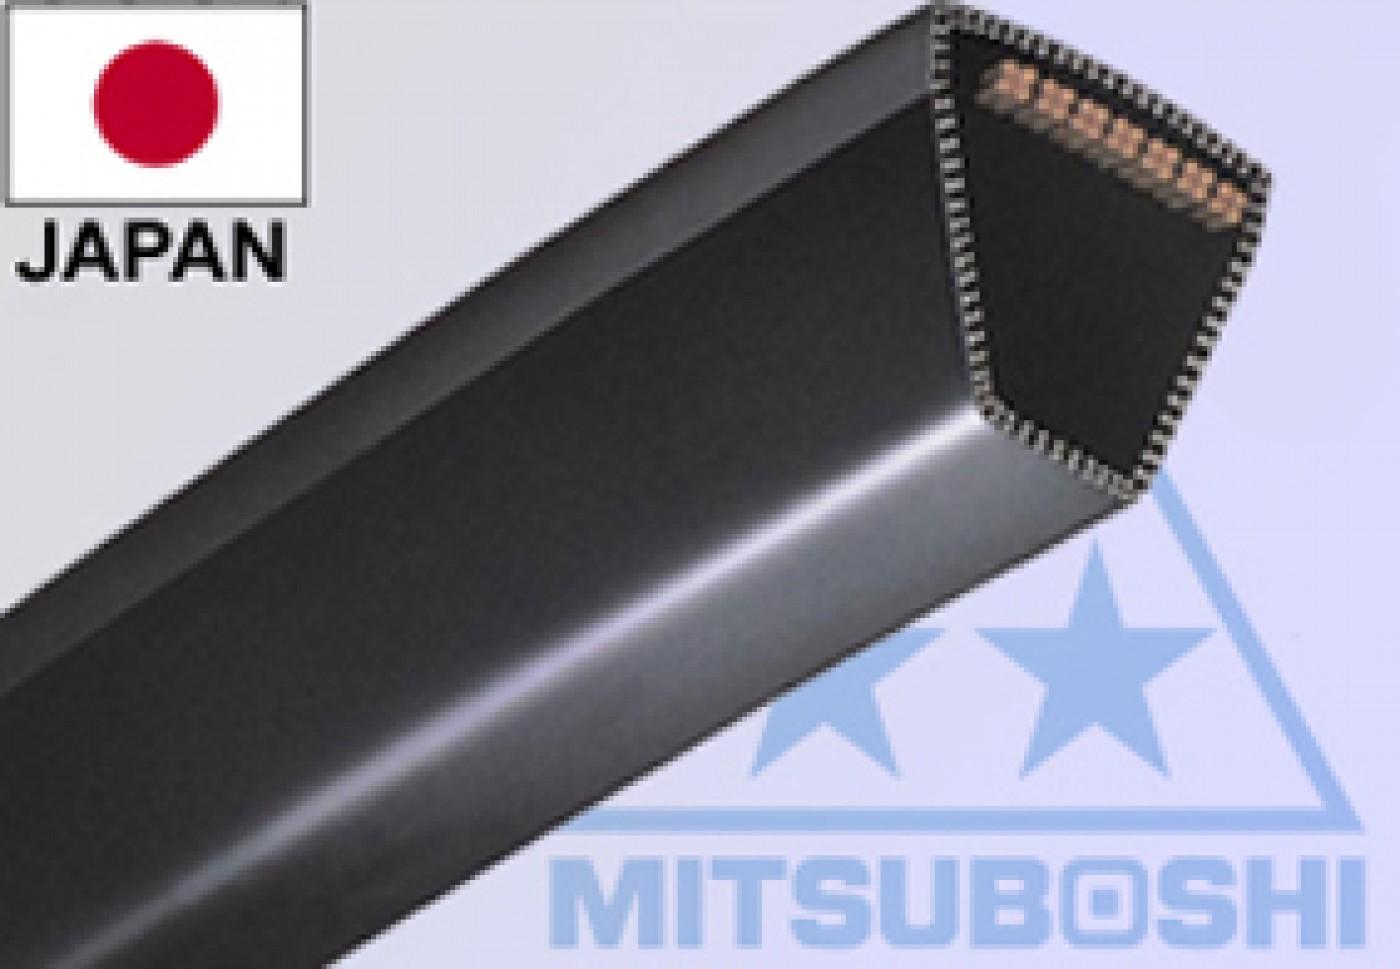 Klínový remen LI670 mm La708 mm